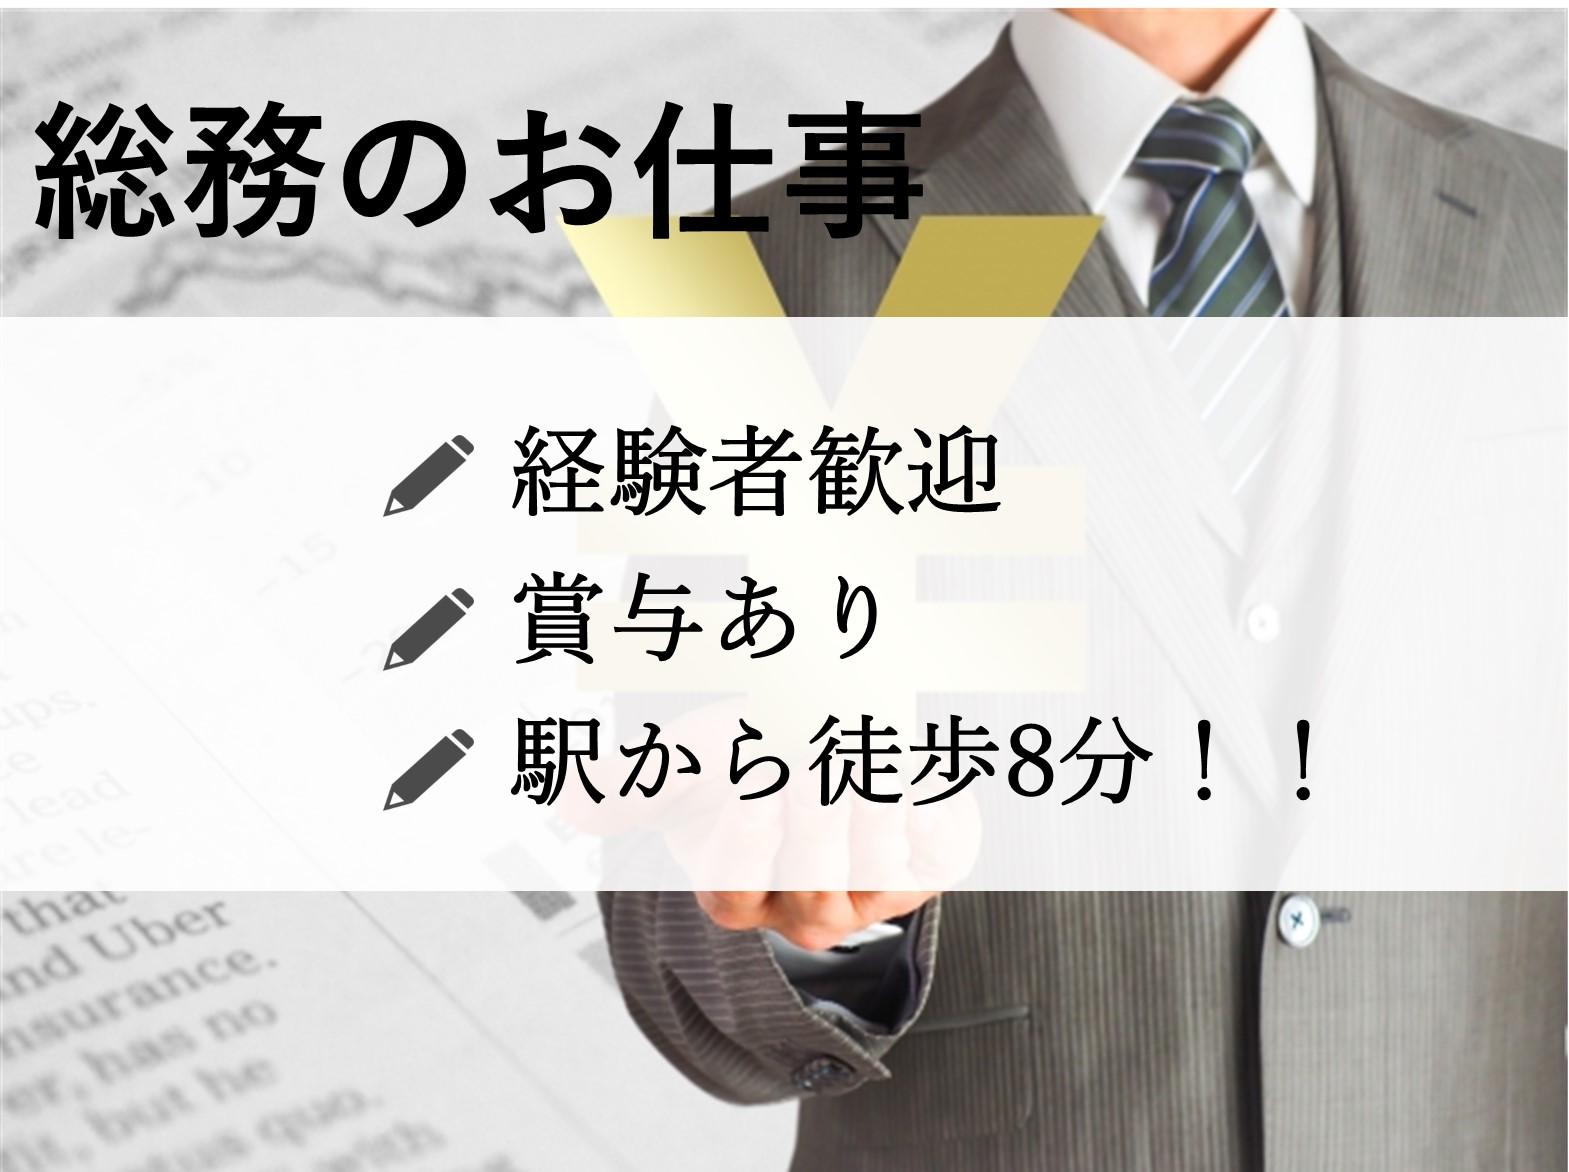 <名古屋市中区><正社員>経験者歓迎!総務業務!駅近! イメージ